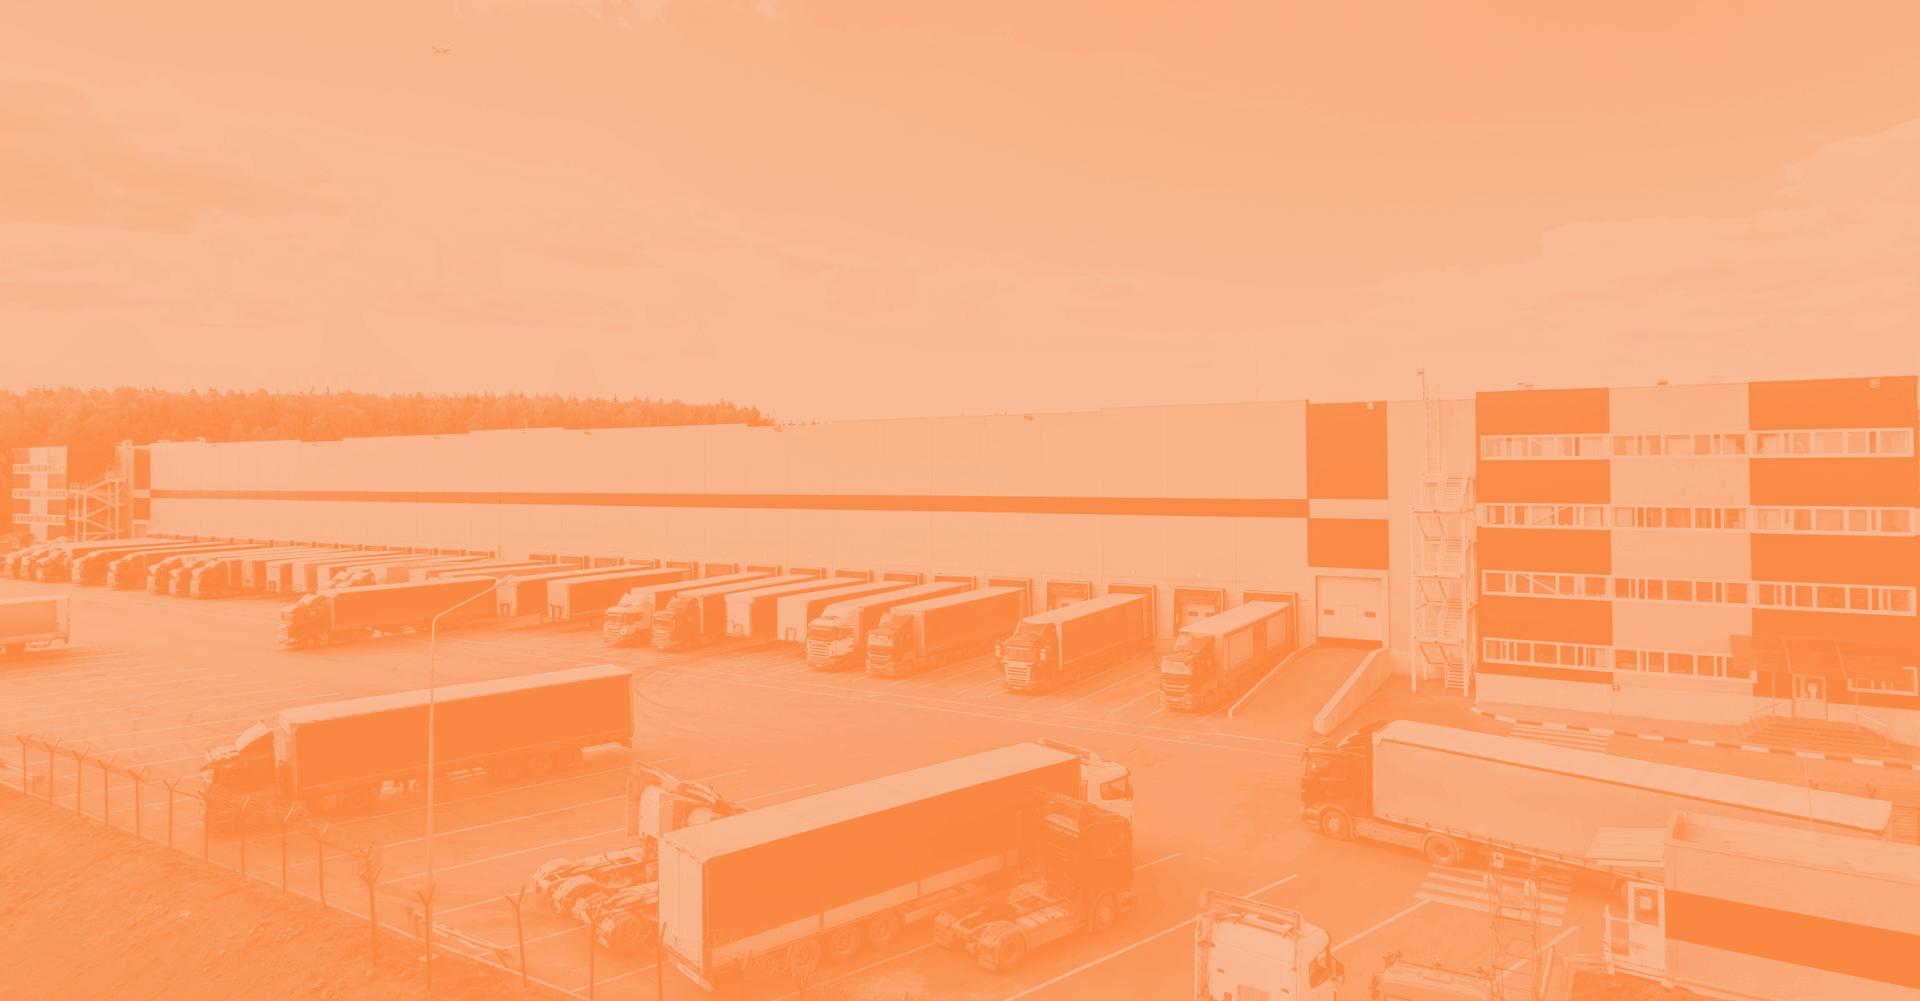 Background Multimodal Cargo